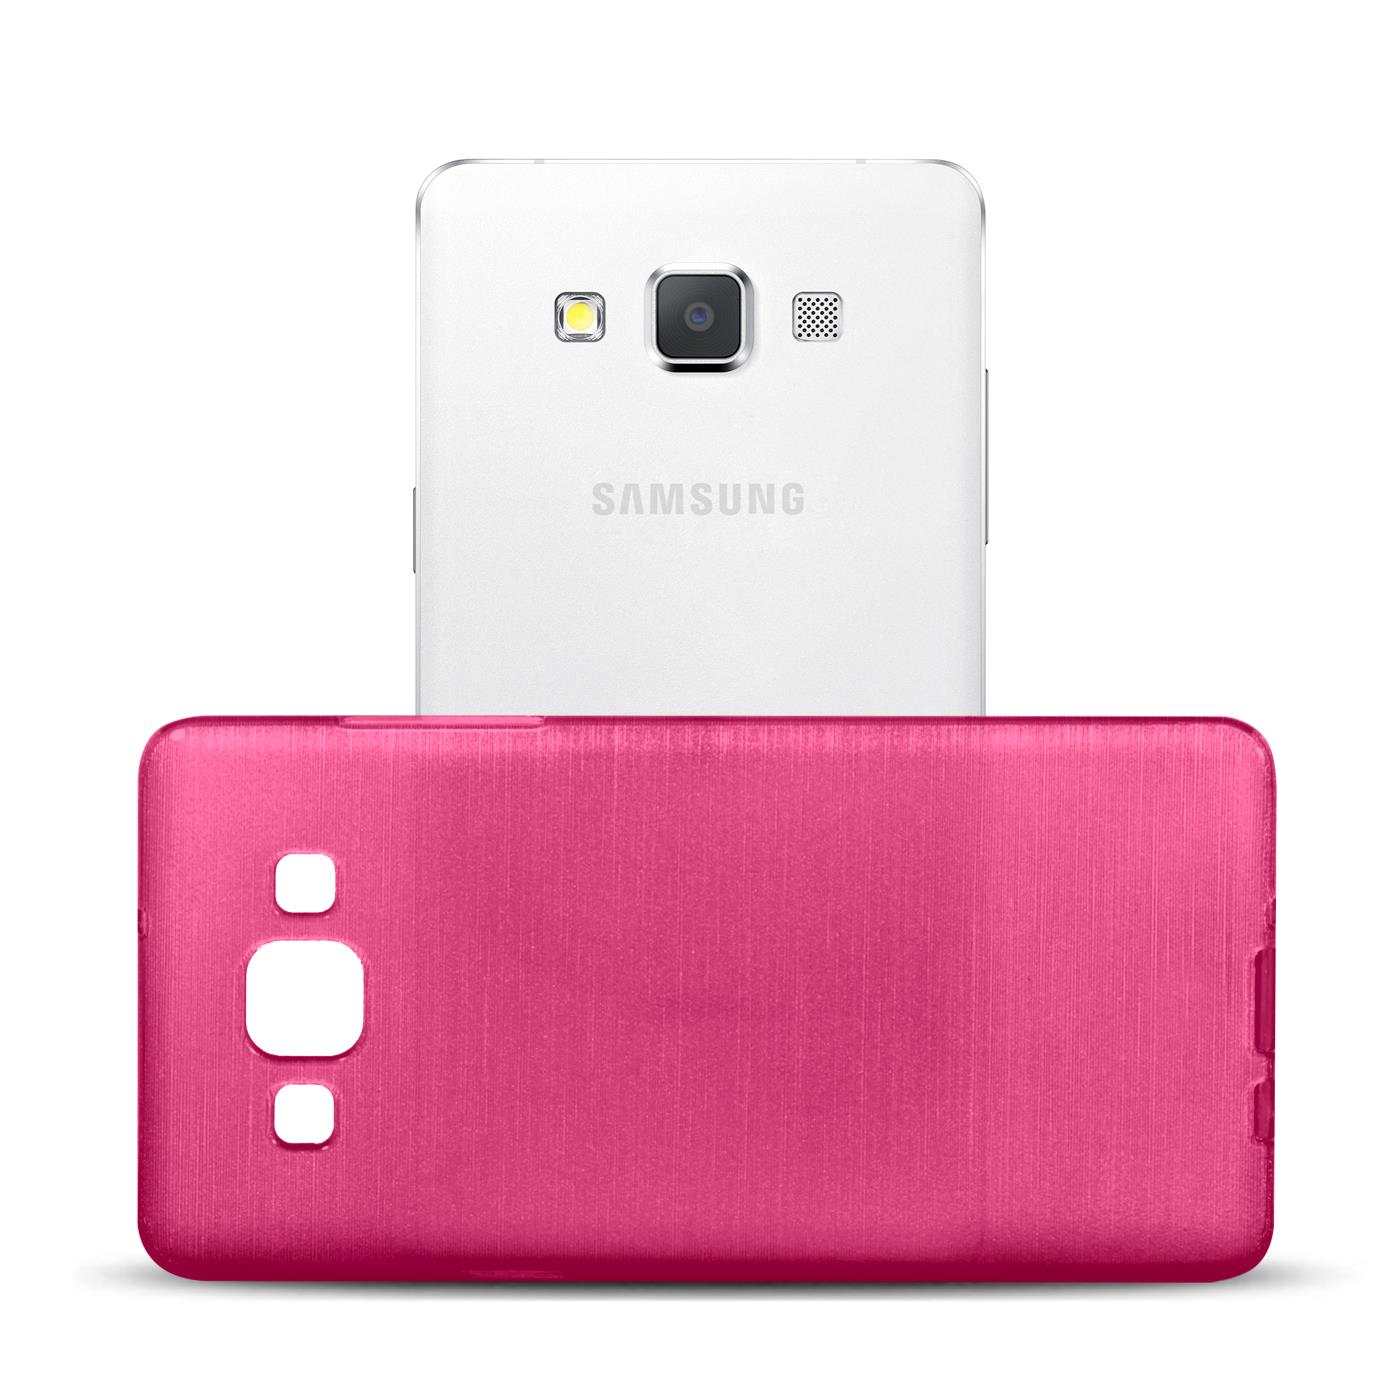 Silikon-Bumper-Case-Samsung-Galaxy-a5-2015-Ultra-Slim-Stossfeste-Rueckschale Indexbild 16